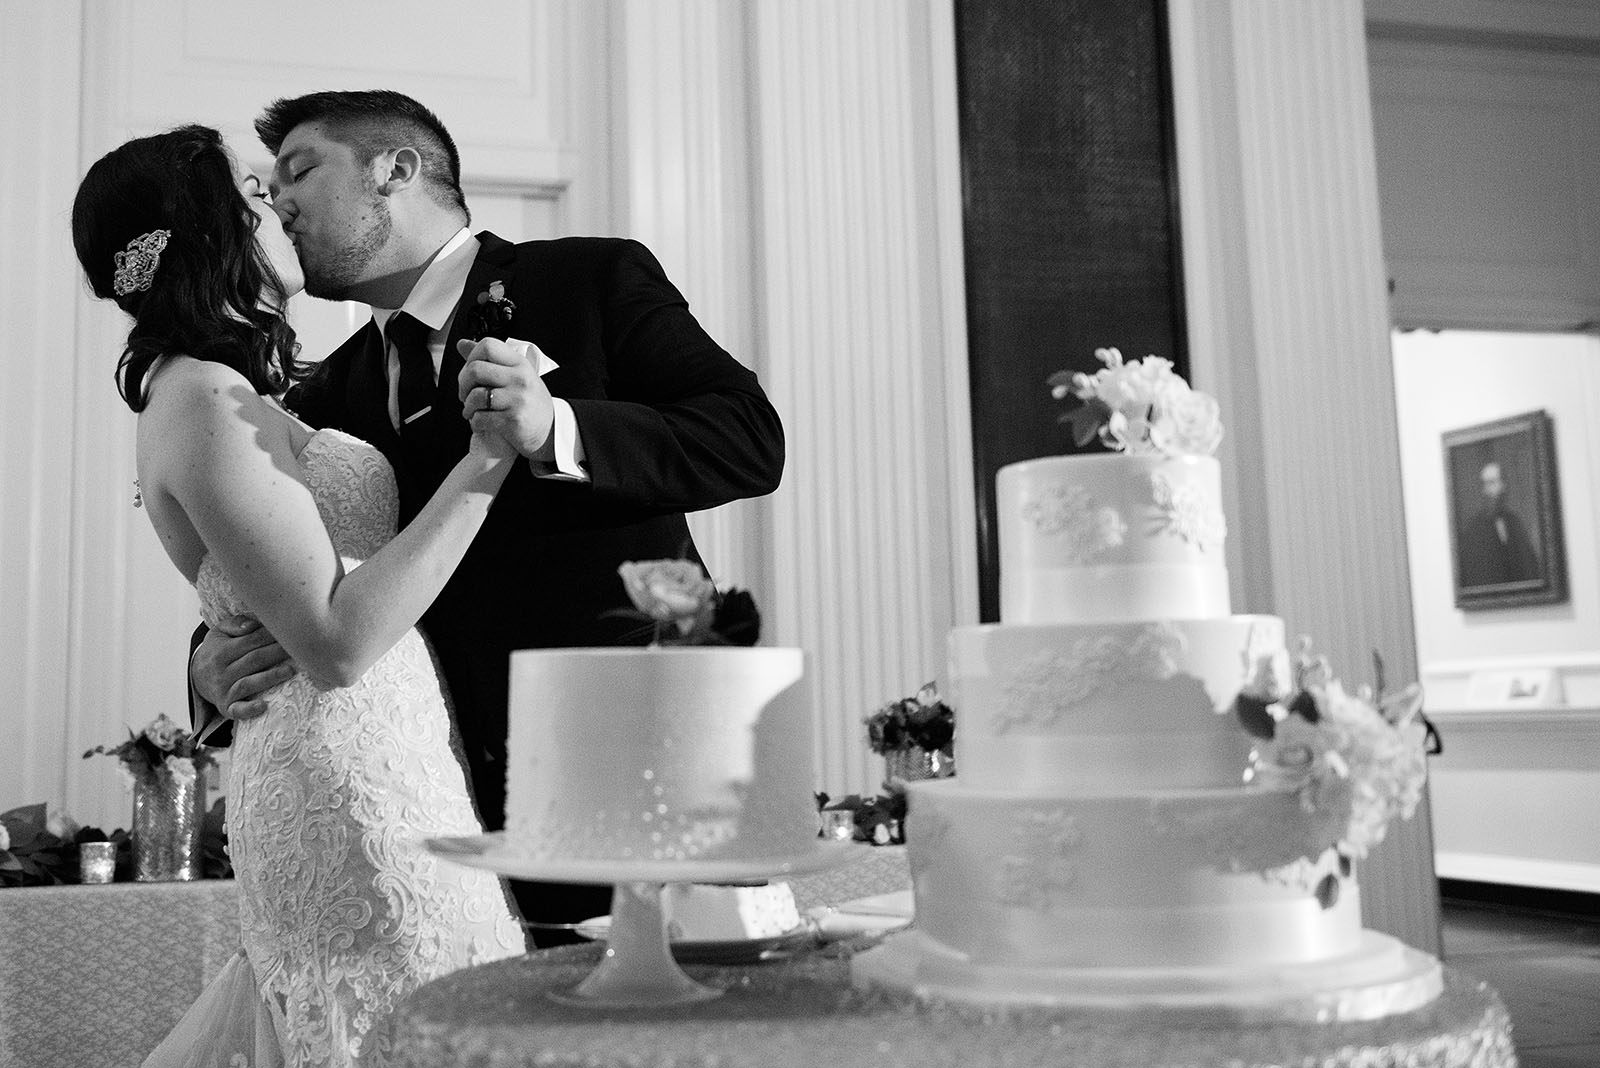 Bride Groom Kiss Wedding Cake Cut